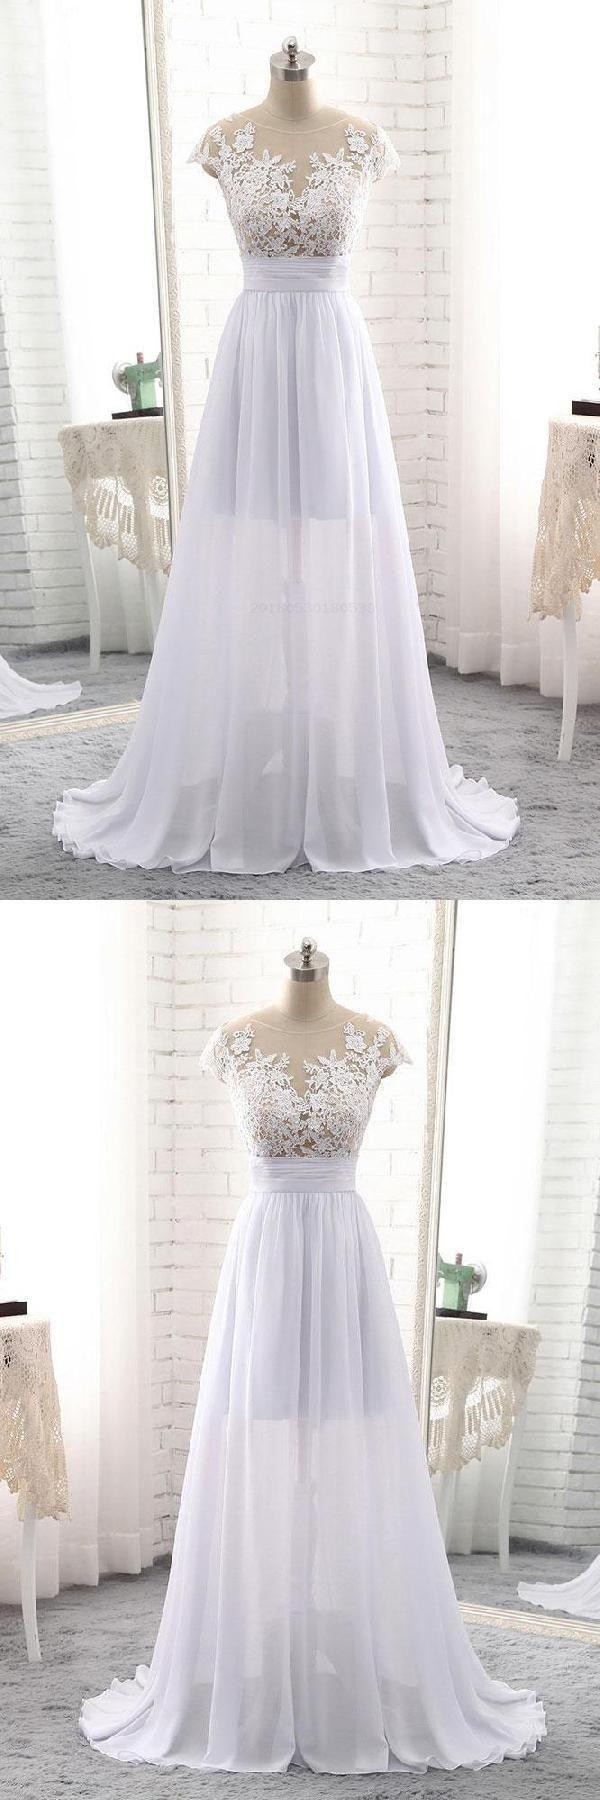 White prom dresses white lace prom dresses lace prom dresses long